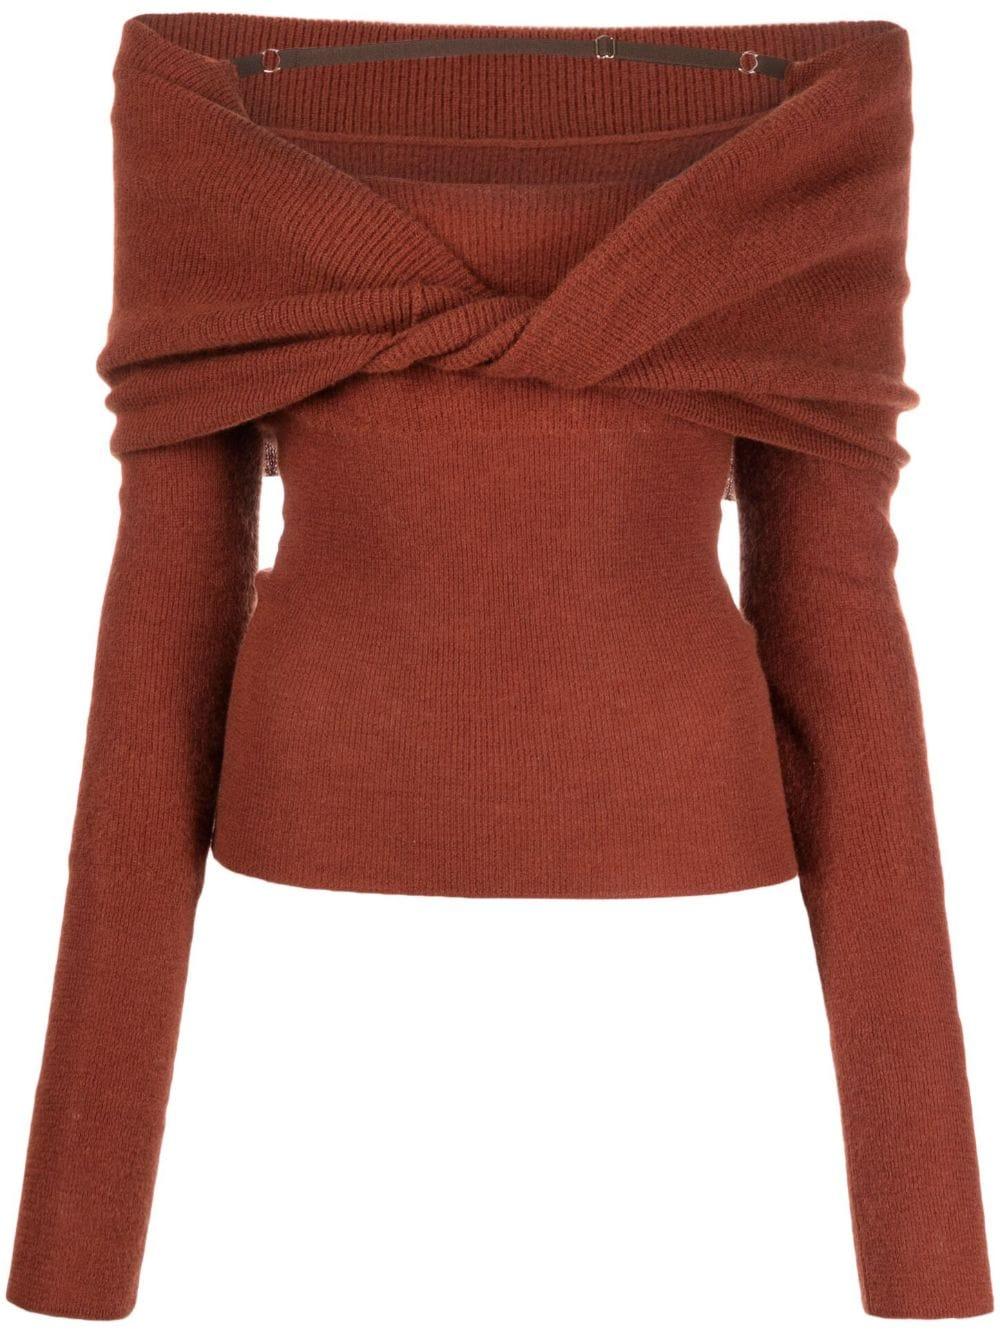 "<p class='small-title'>JACQUEMUS</p>"" La maille Ascua "" Off-the-shoulder sweater"